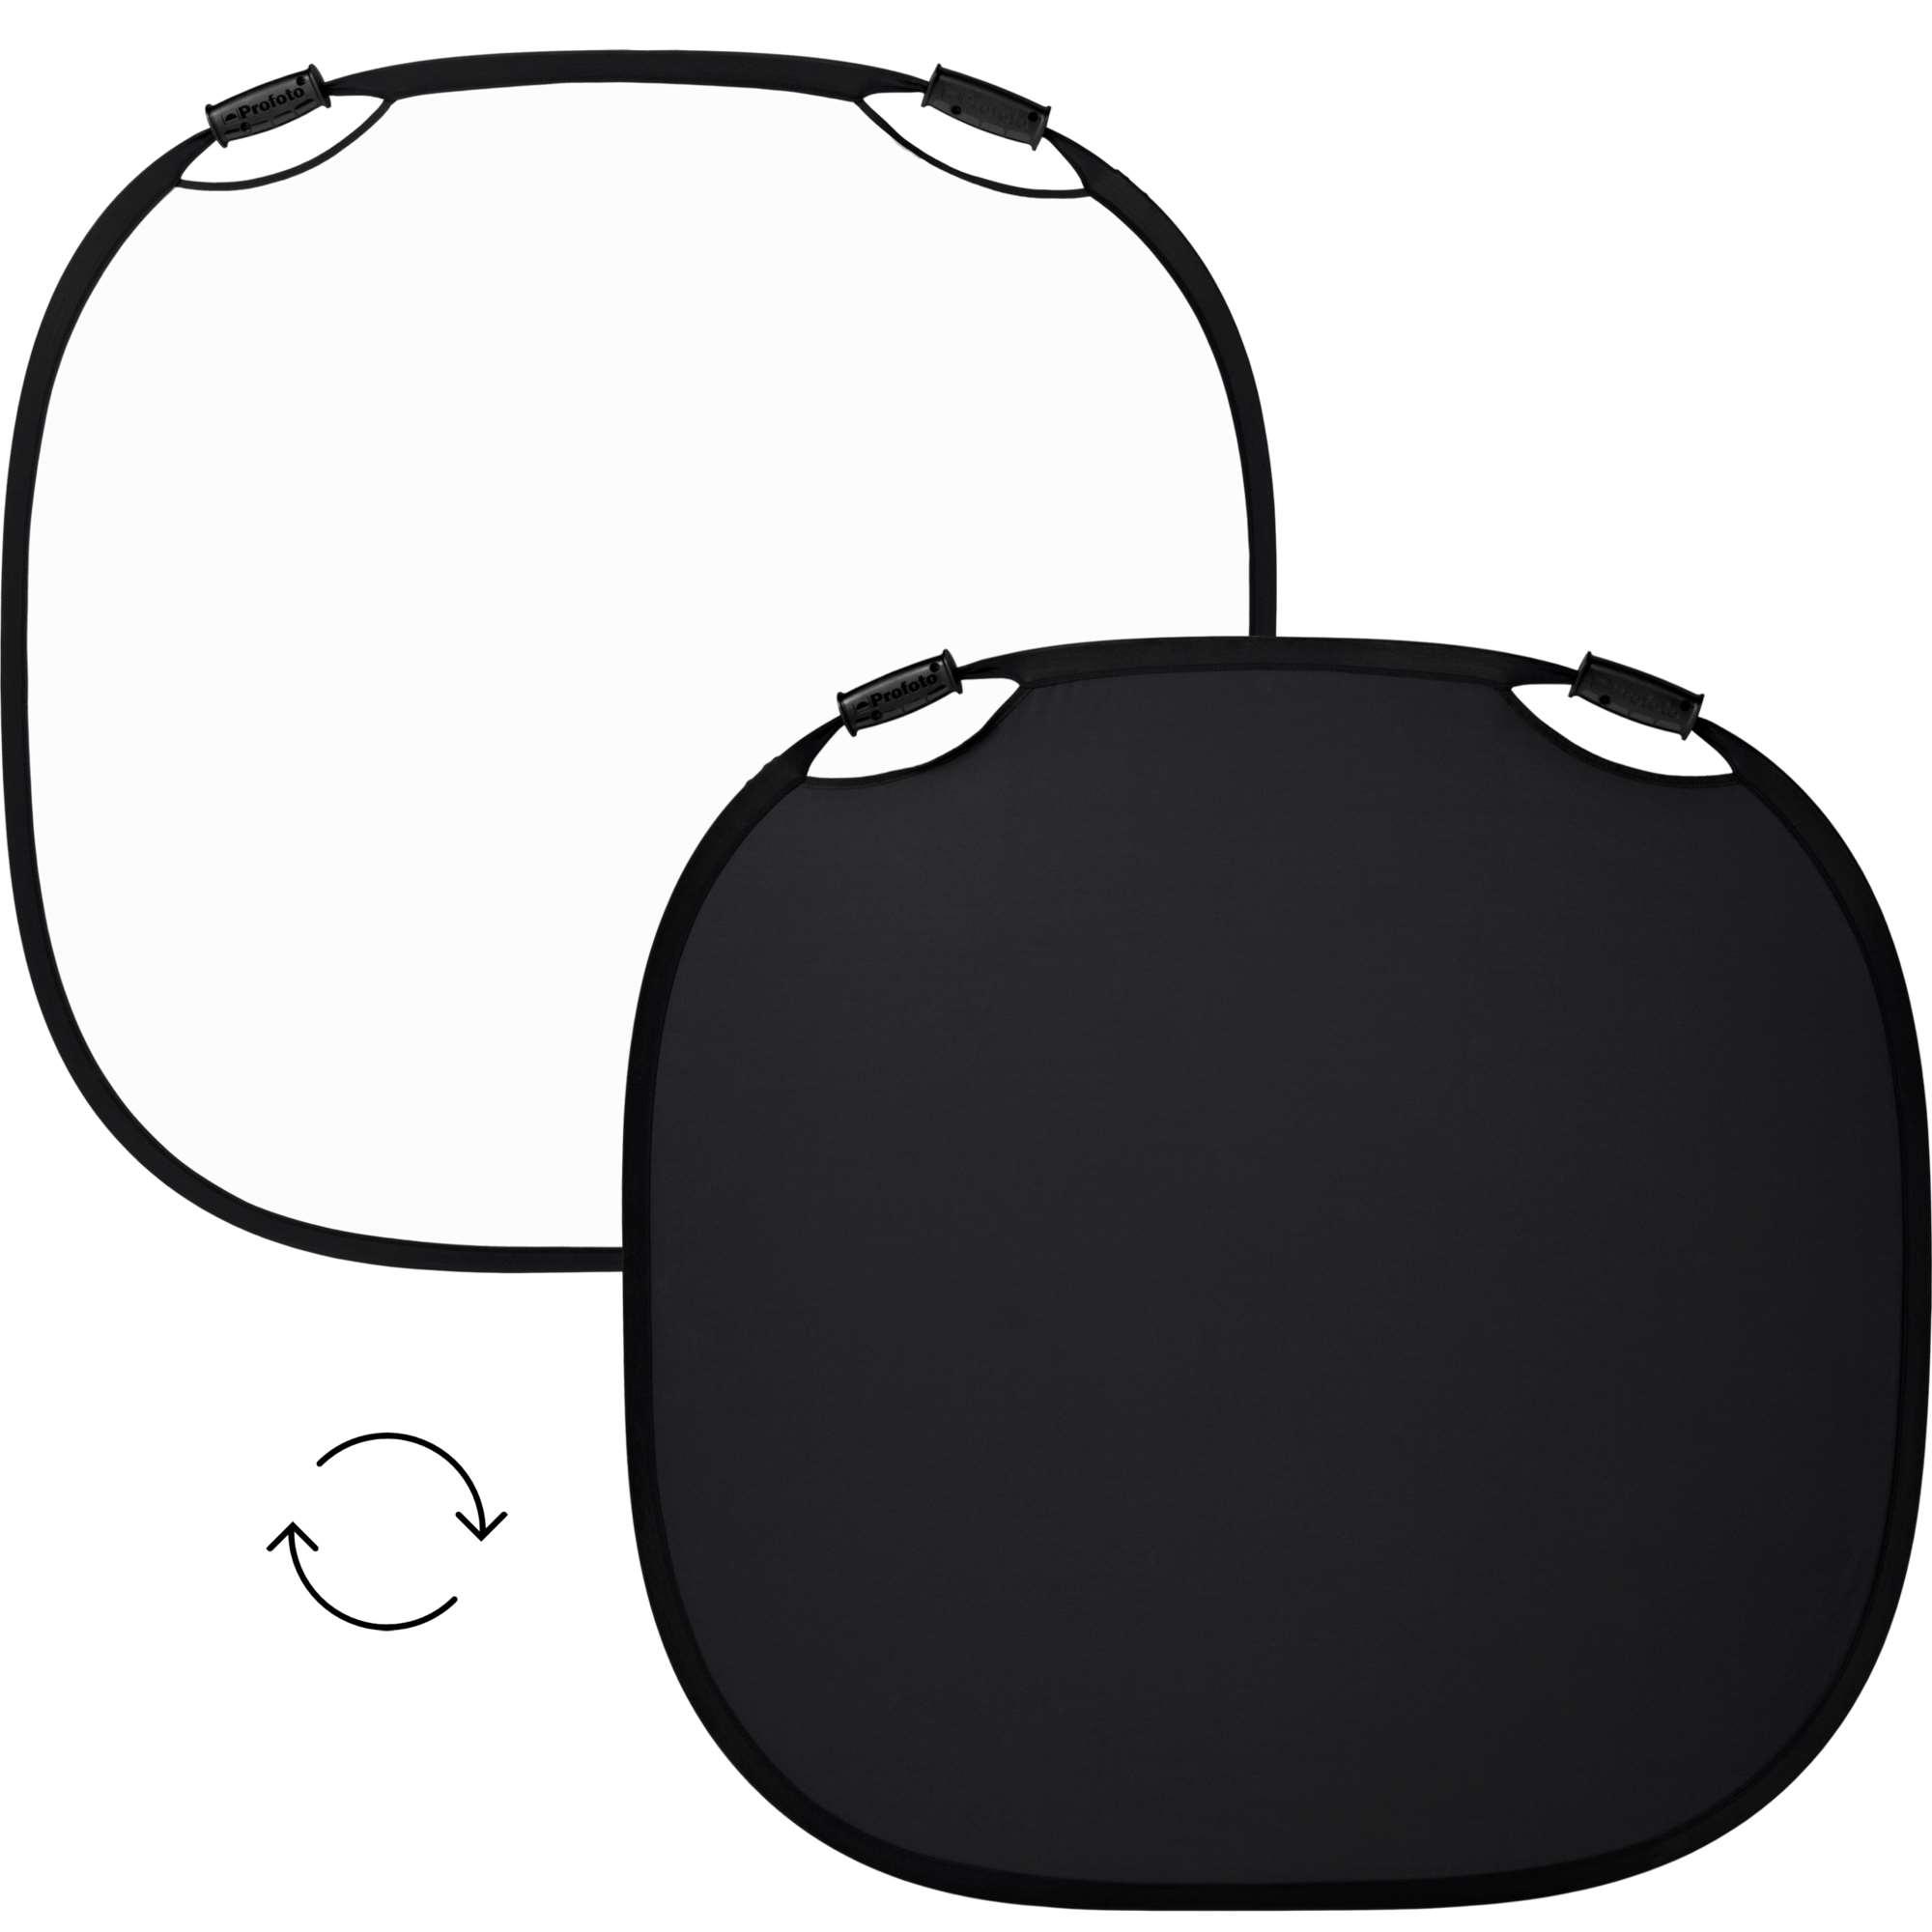 Profoto collapsible reflector l black/white (100967)